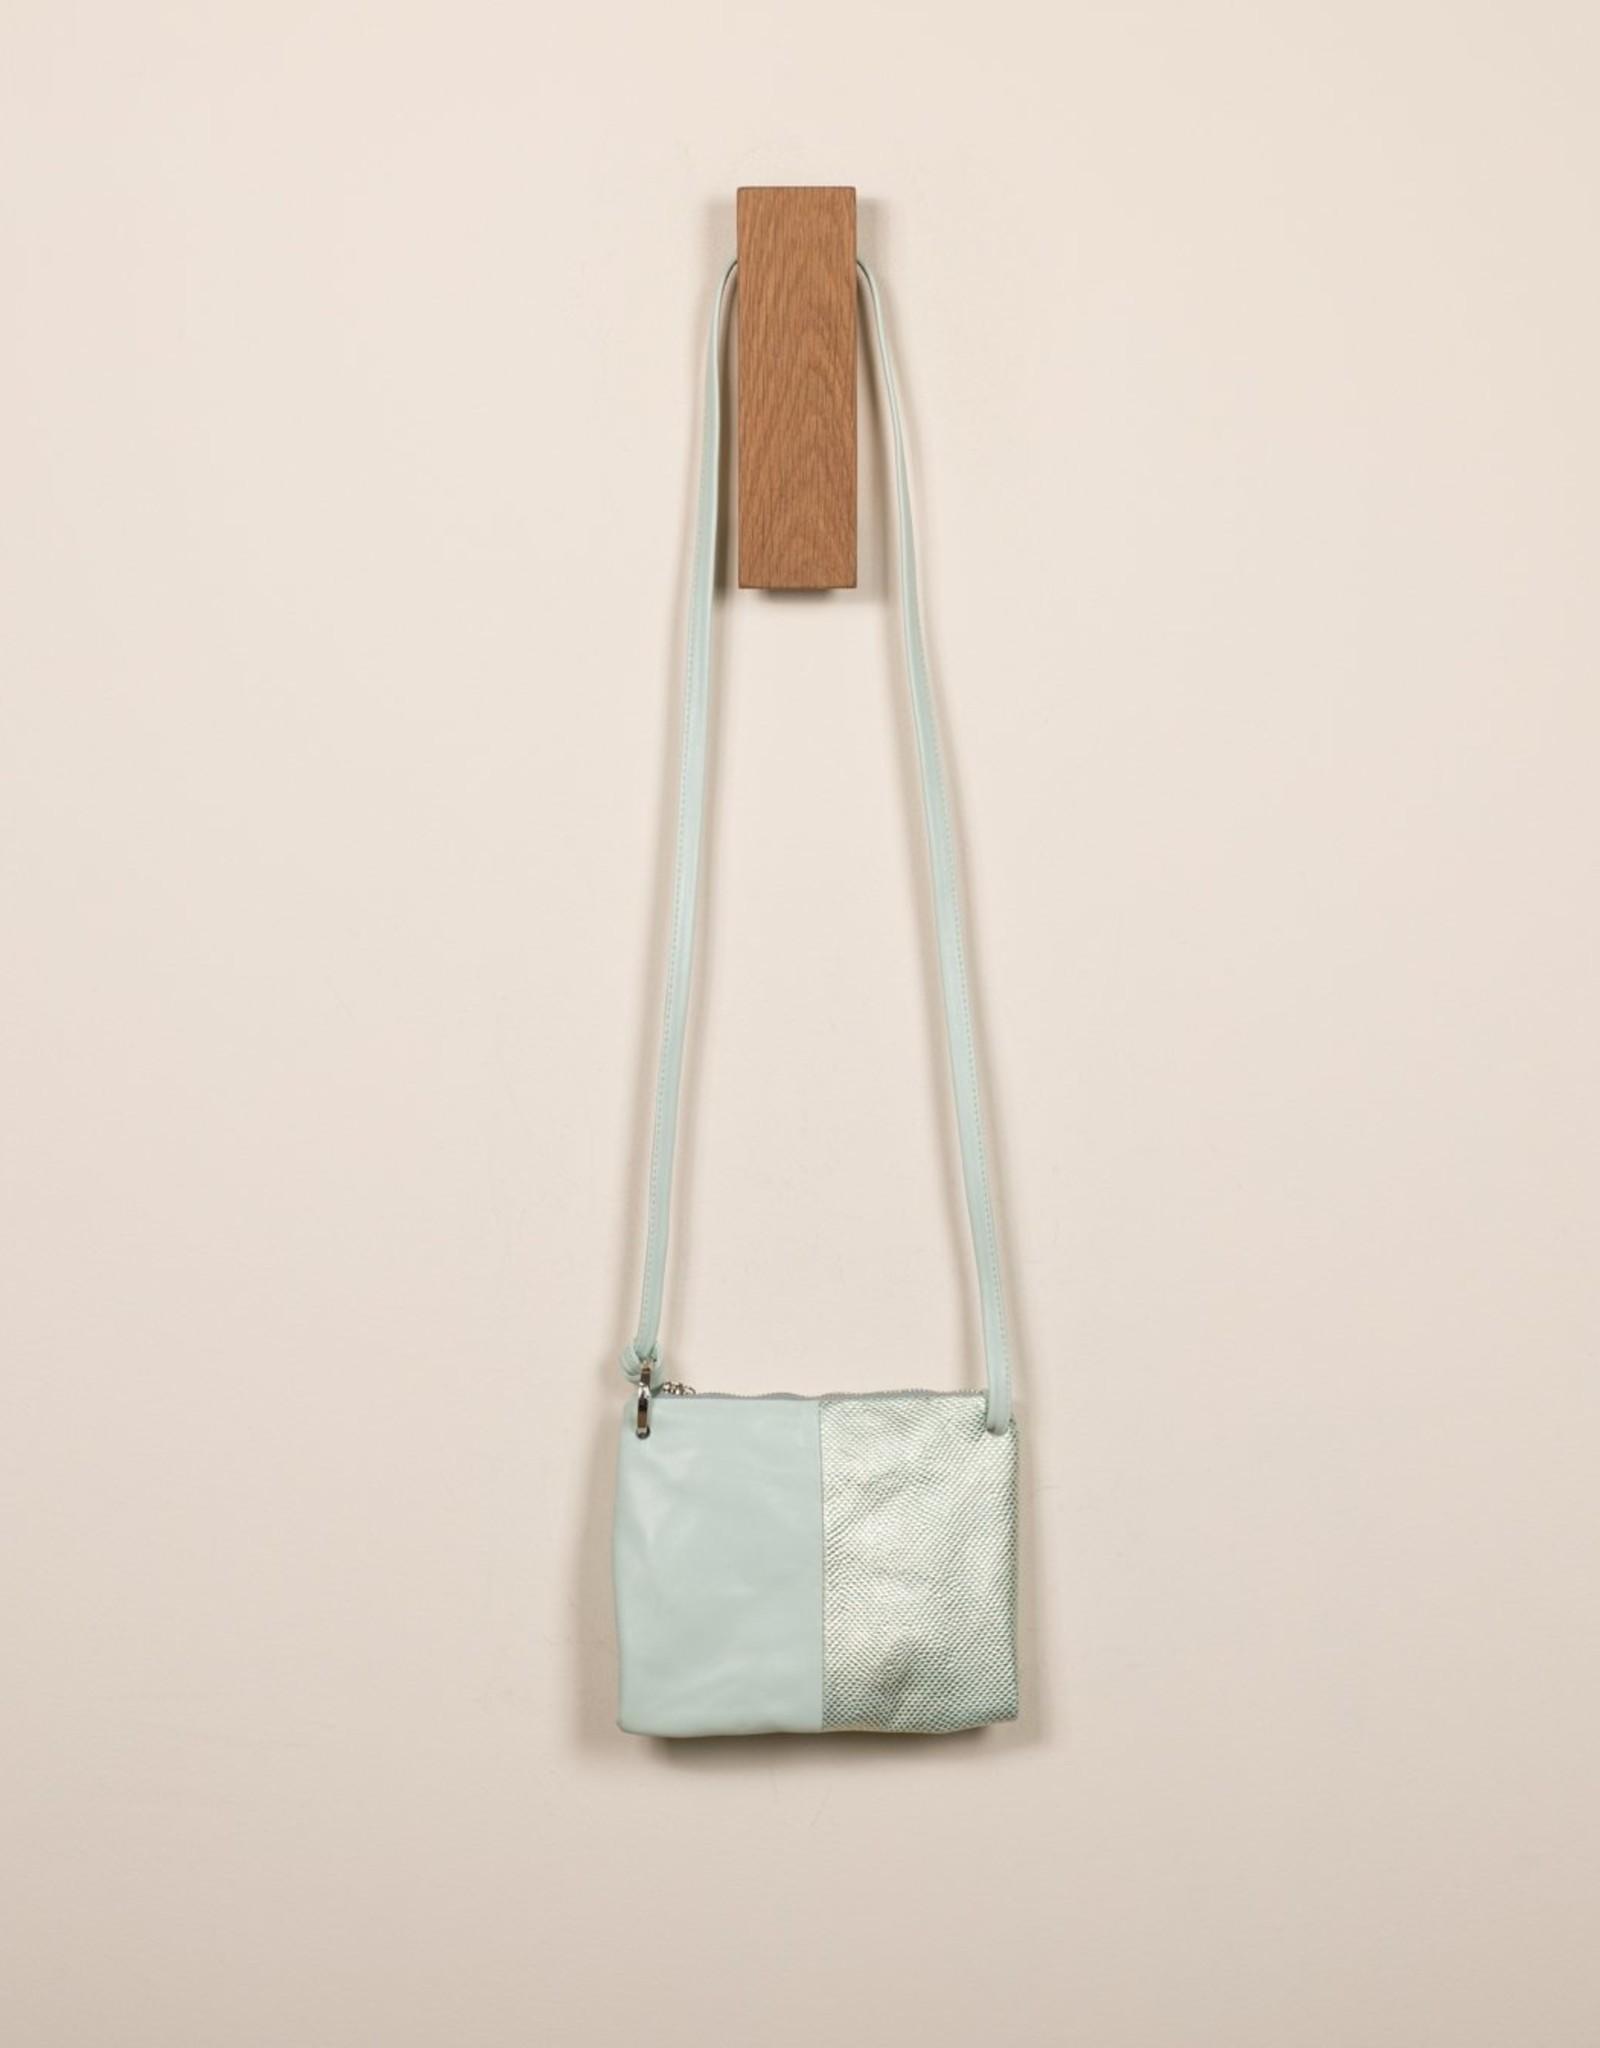 Daniella Lehavi Kennedy Bag